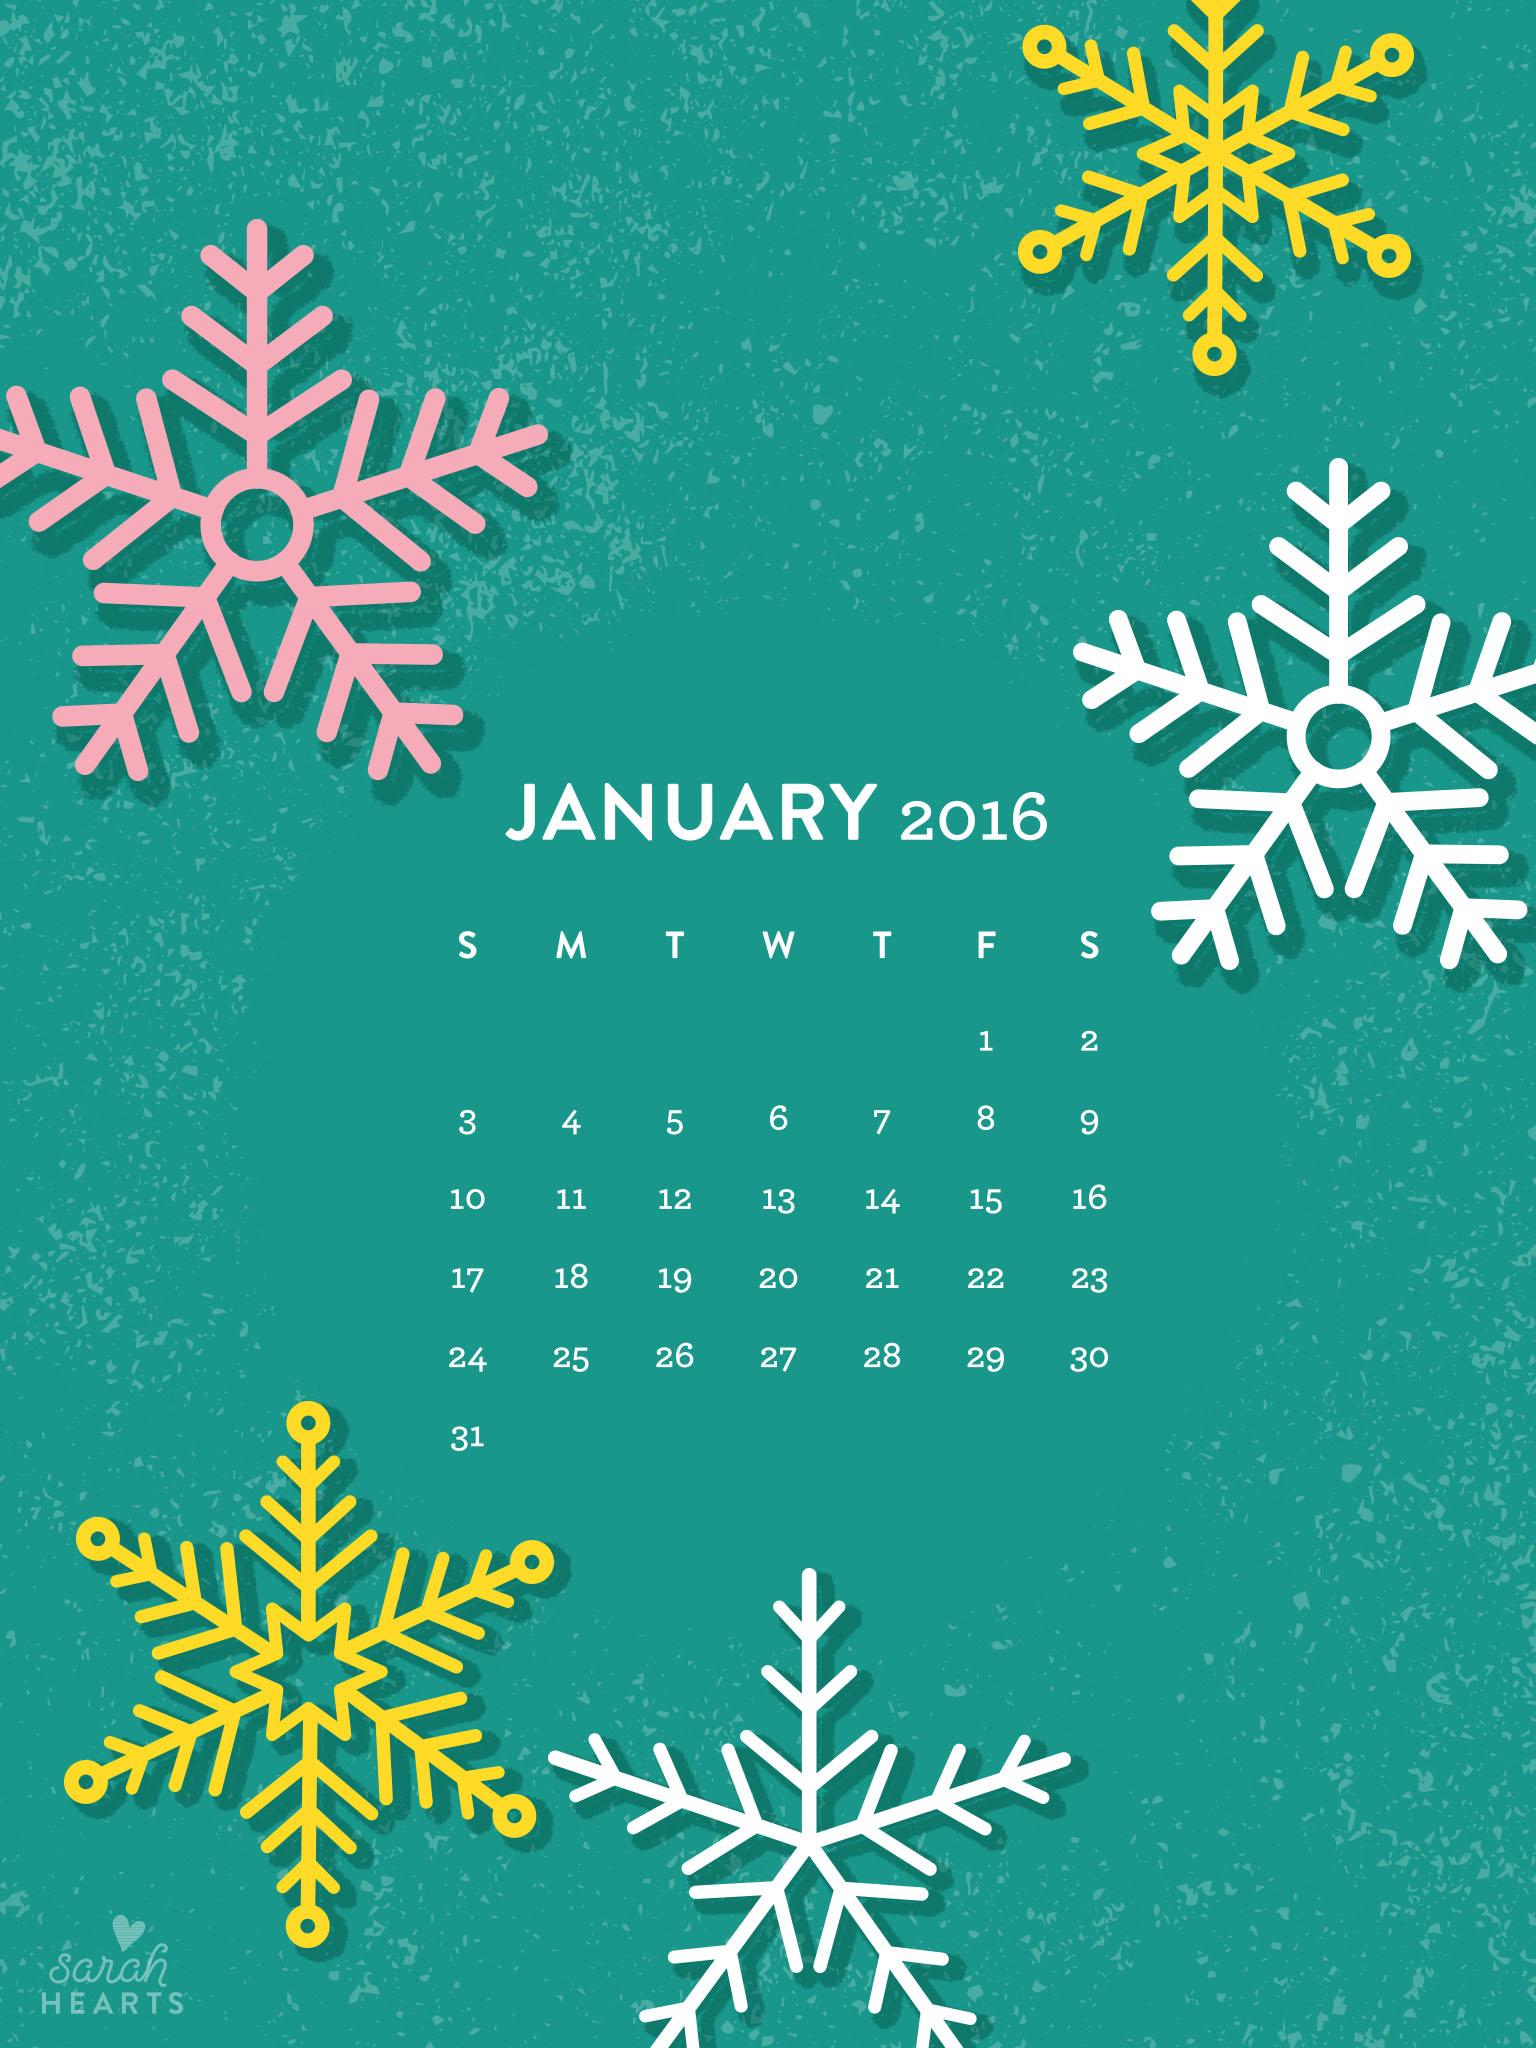 January 2016 Calendar Wallpaper   Sarah Hearts 1536x2048